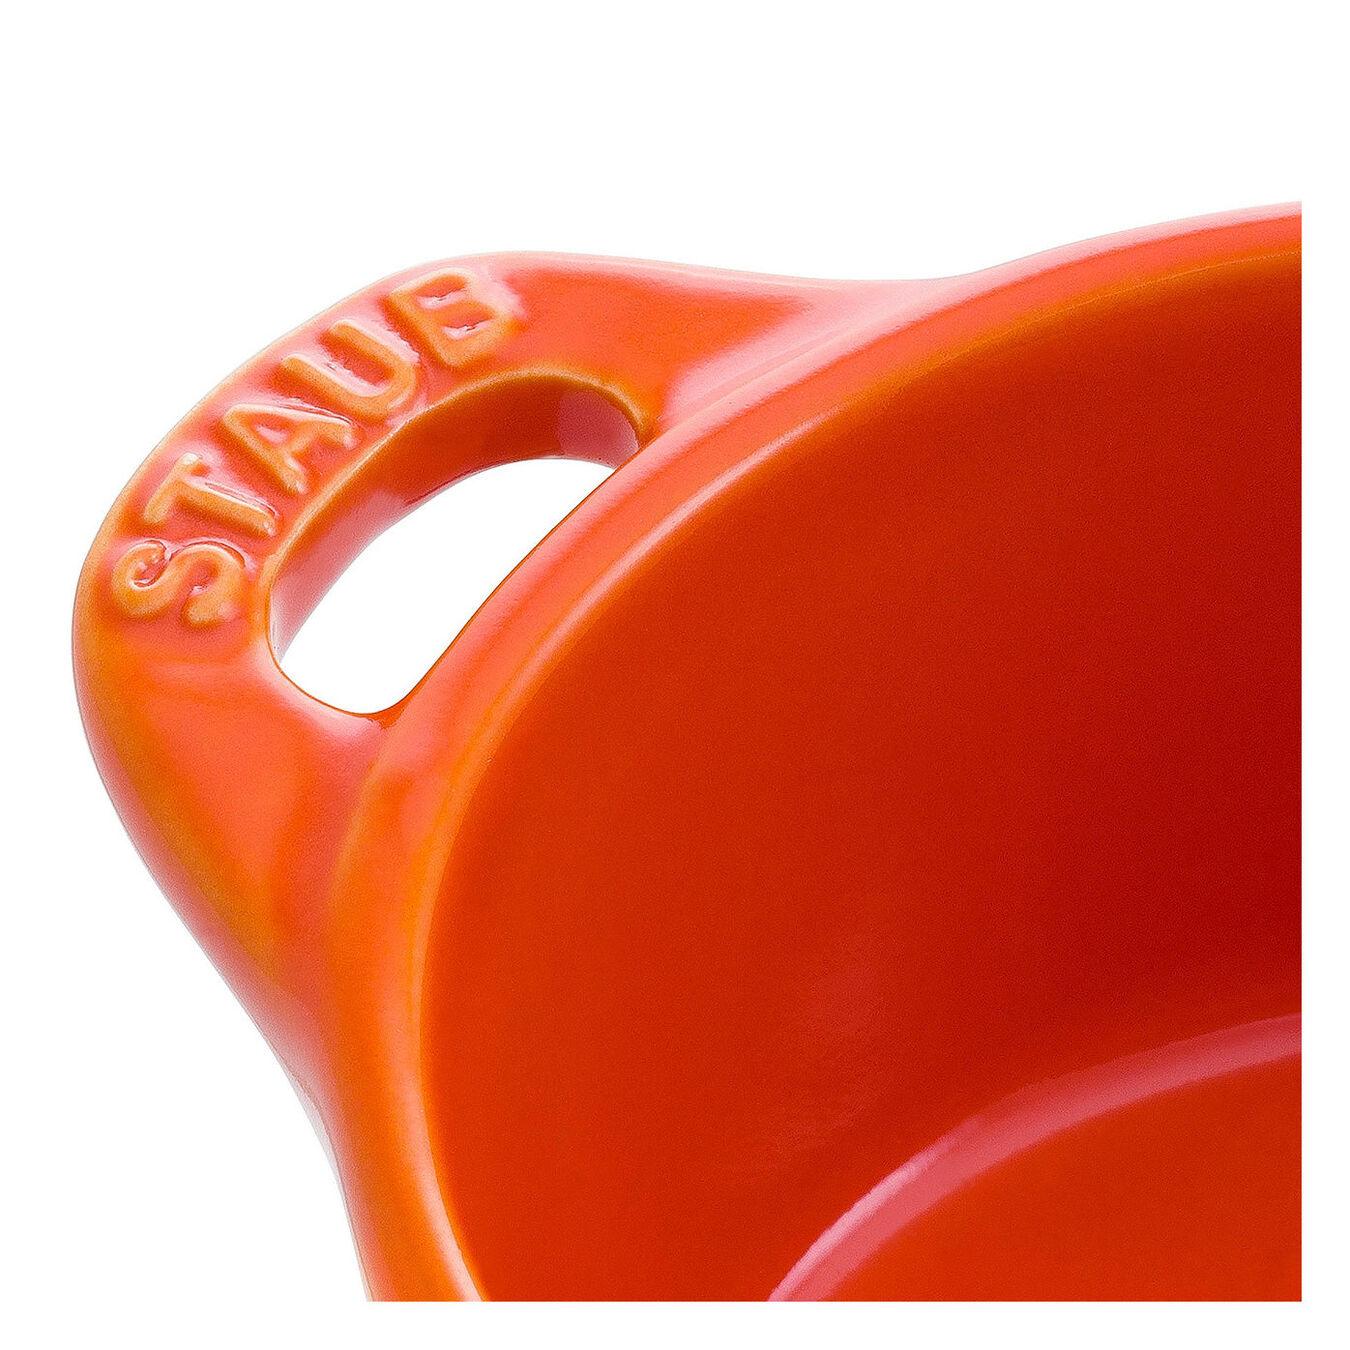 Mini Cocotte 10 cm, Rund, Orange, Stentøj,,large 4